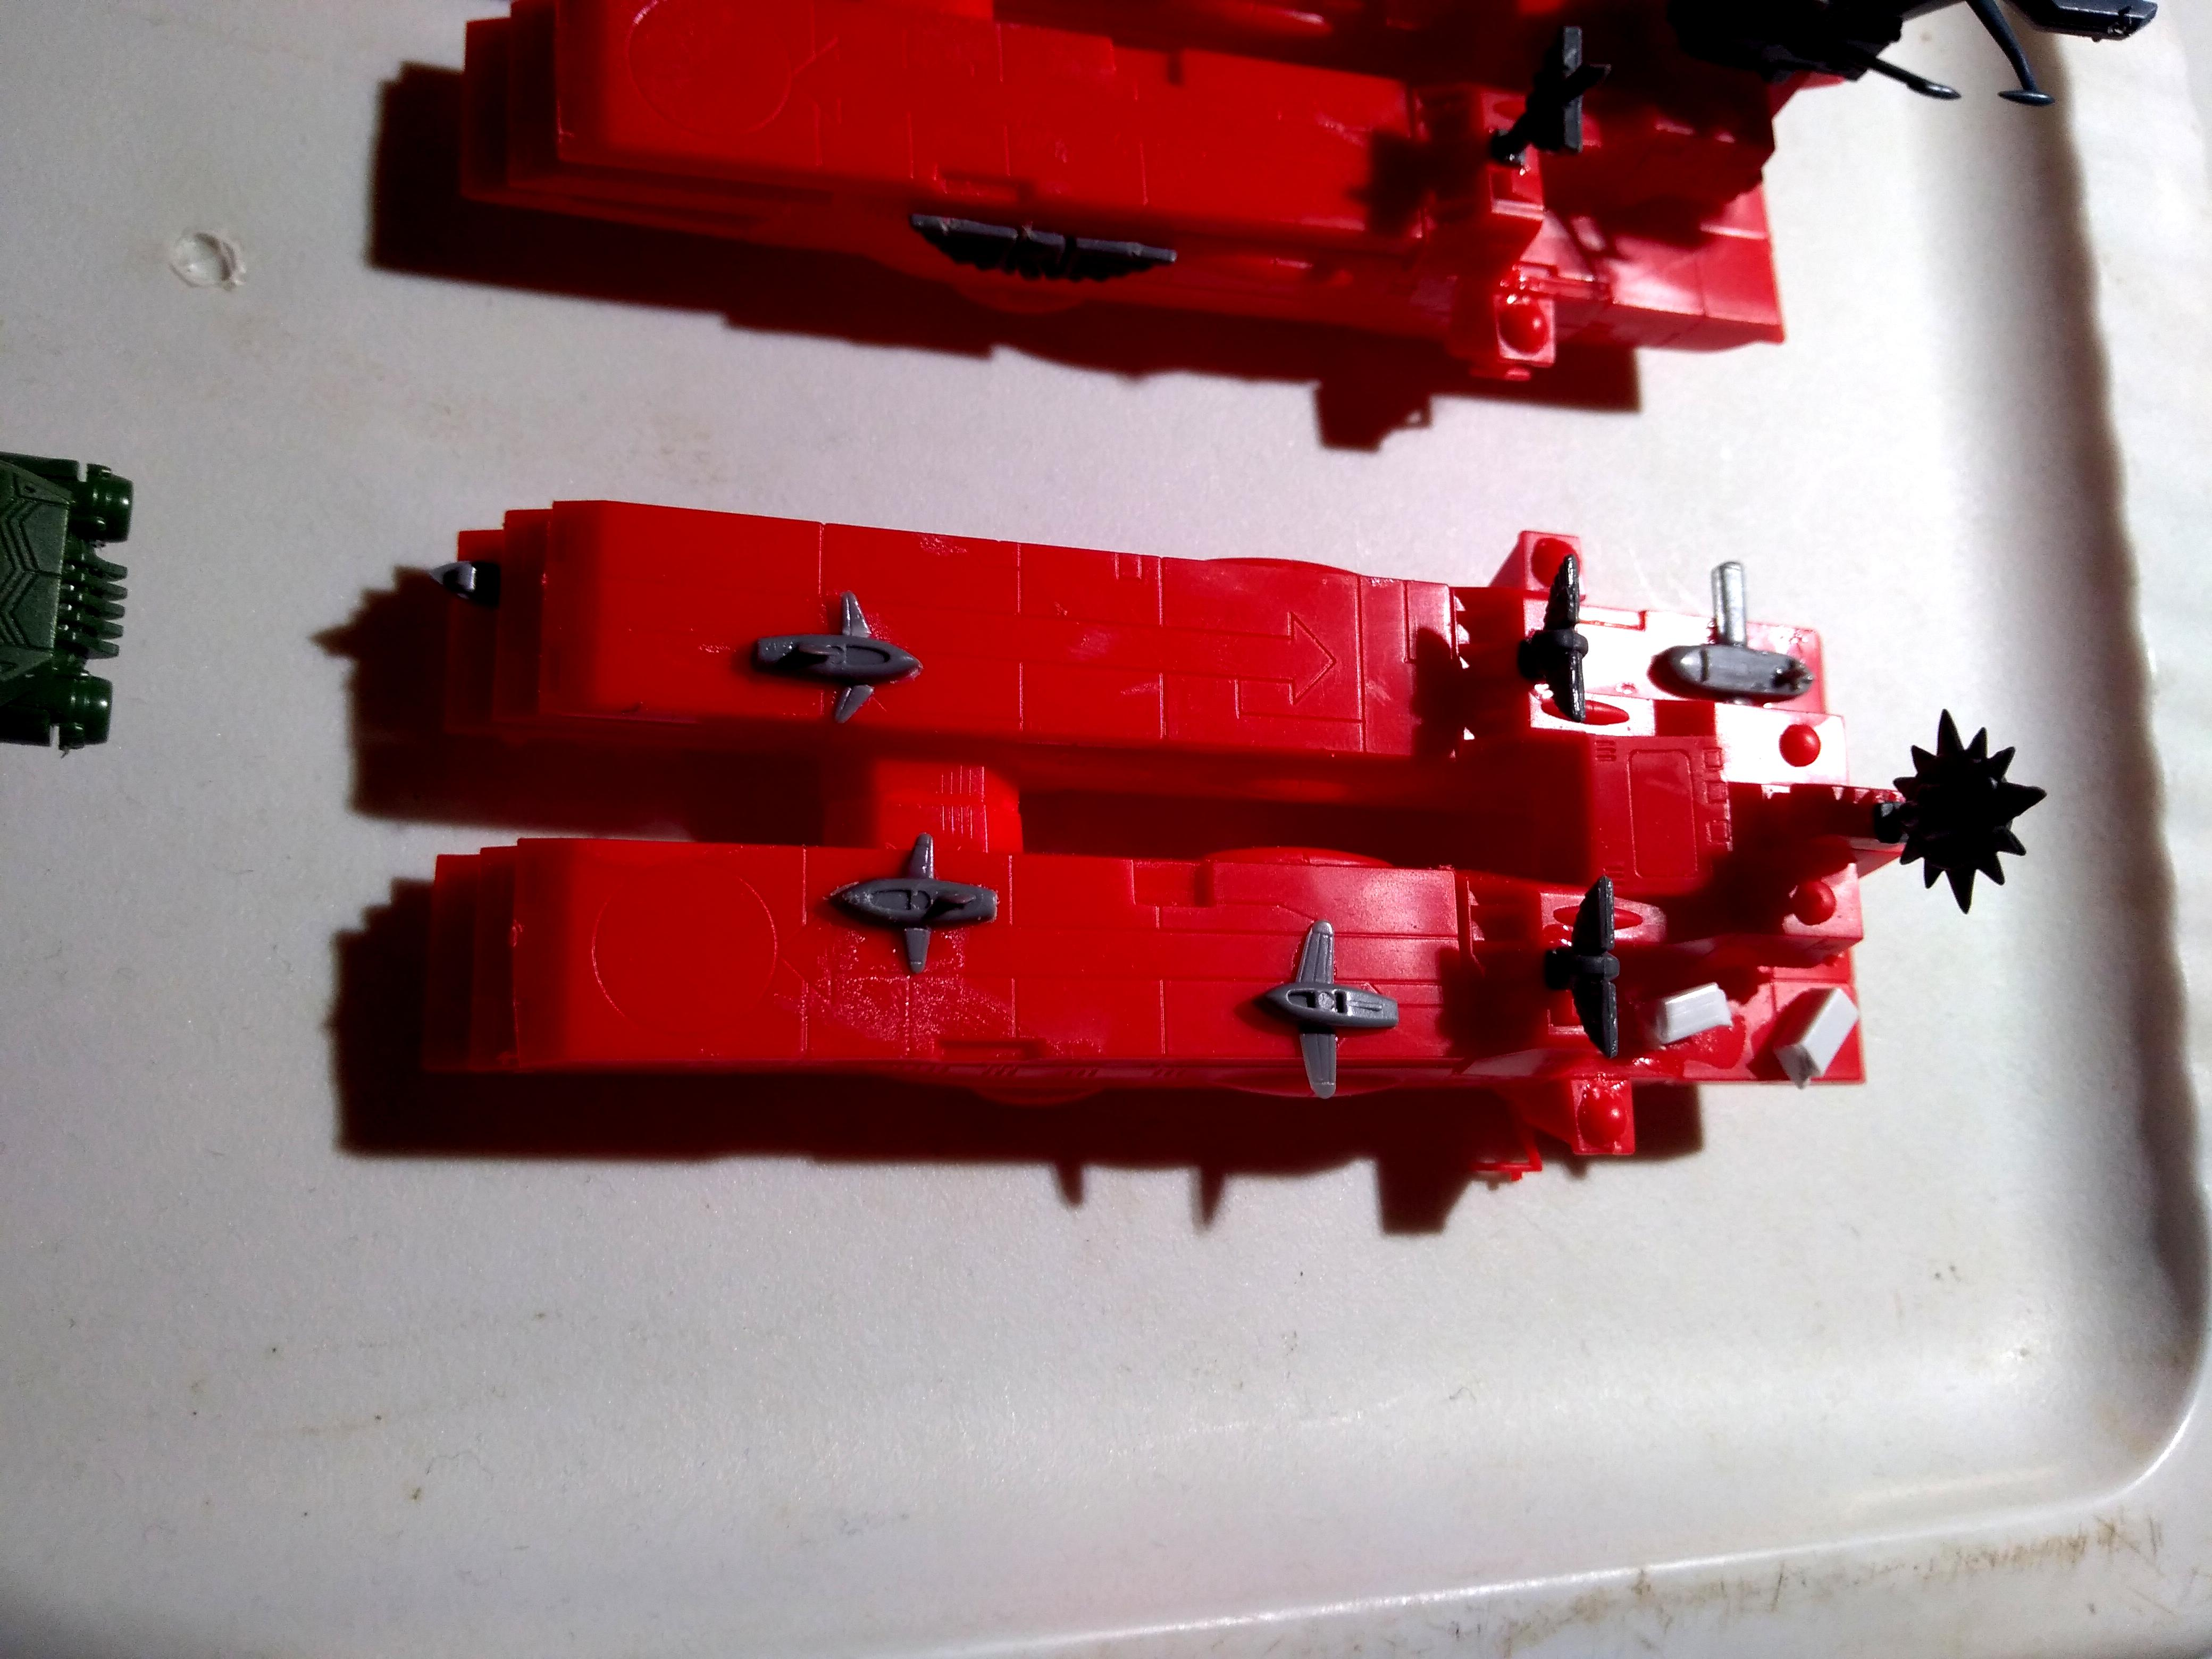 Bandai, Battlefleet Gothic, Mass Conveyer, Space Ship, Yamato